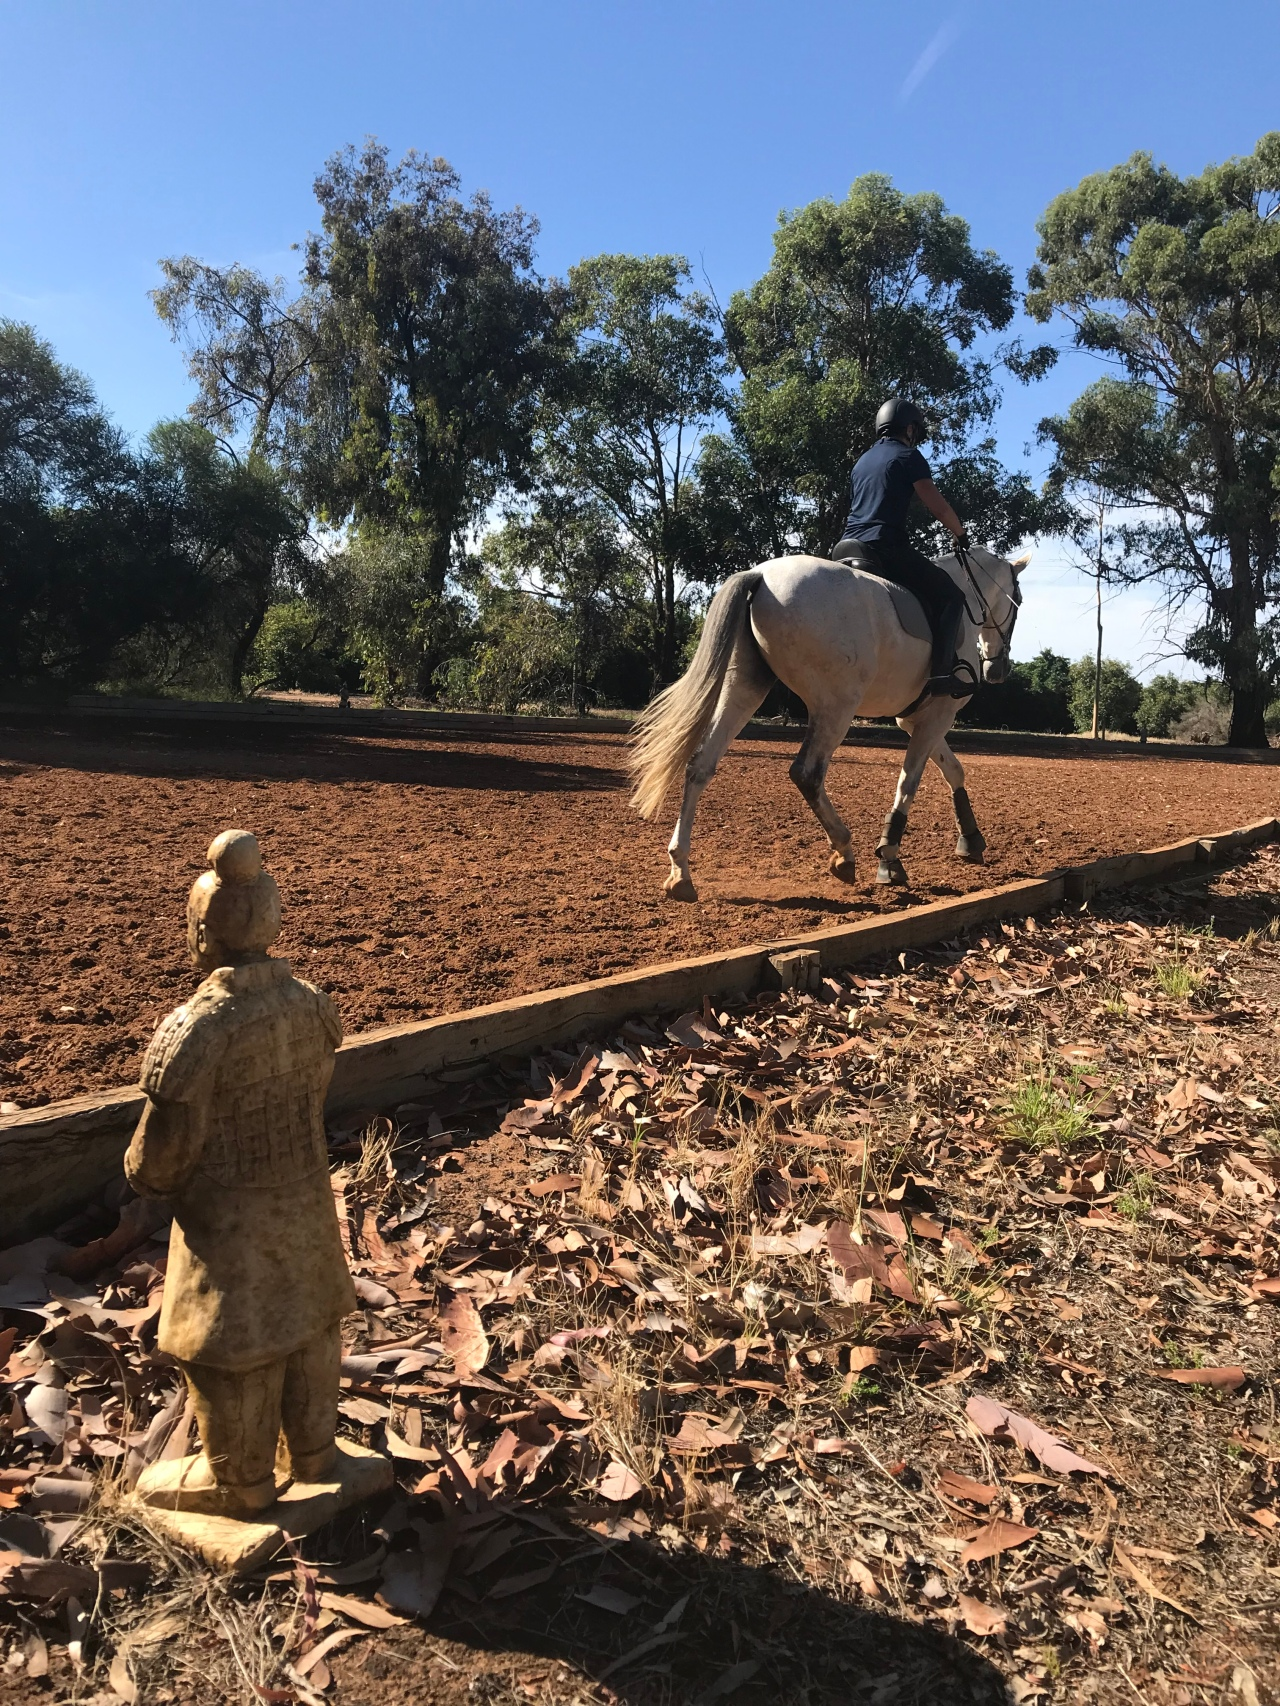 Pregnancy…Horseriding, hormones, homesick